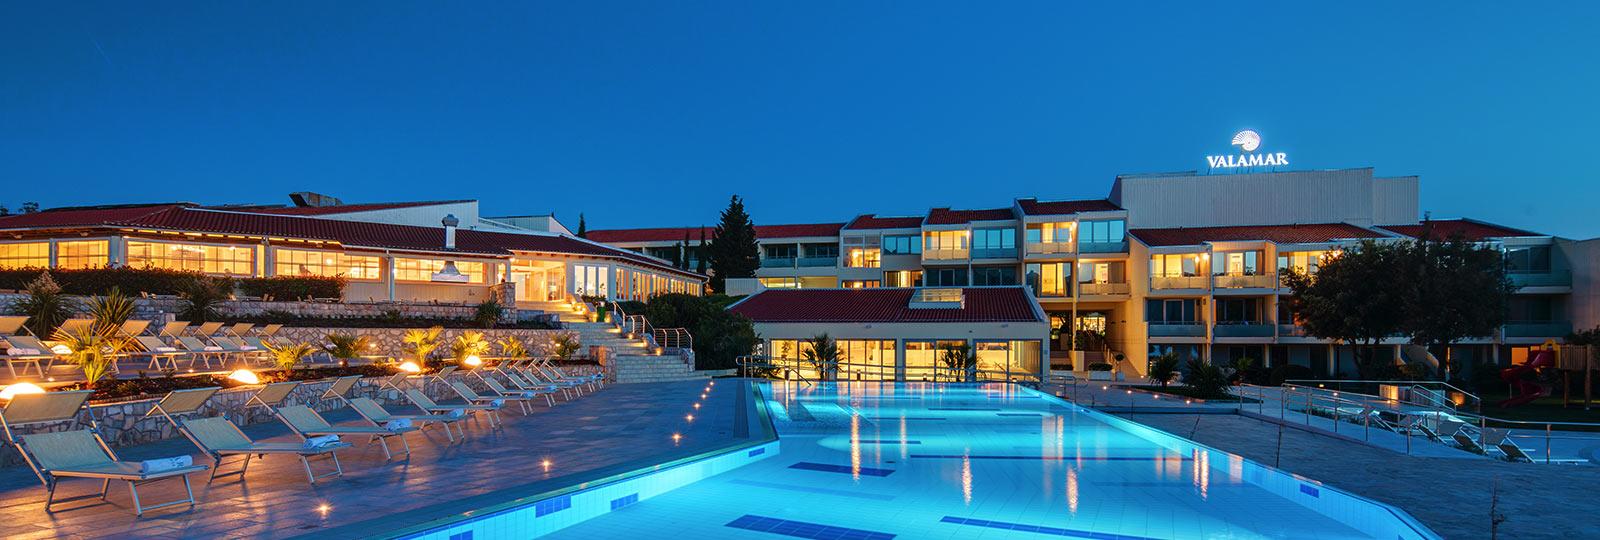 Argosy casino suites santana-43262